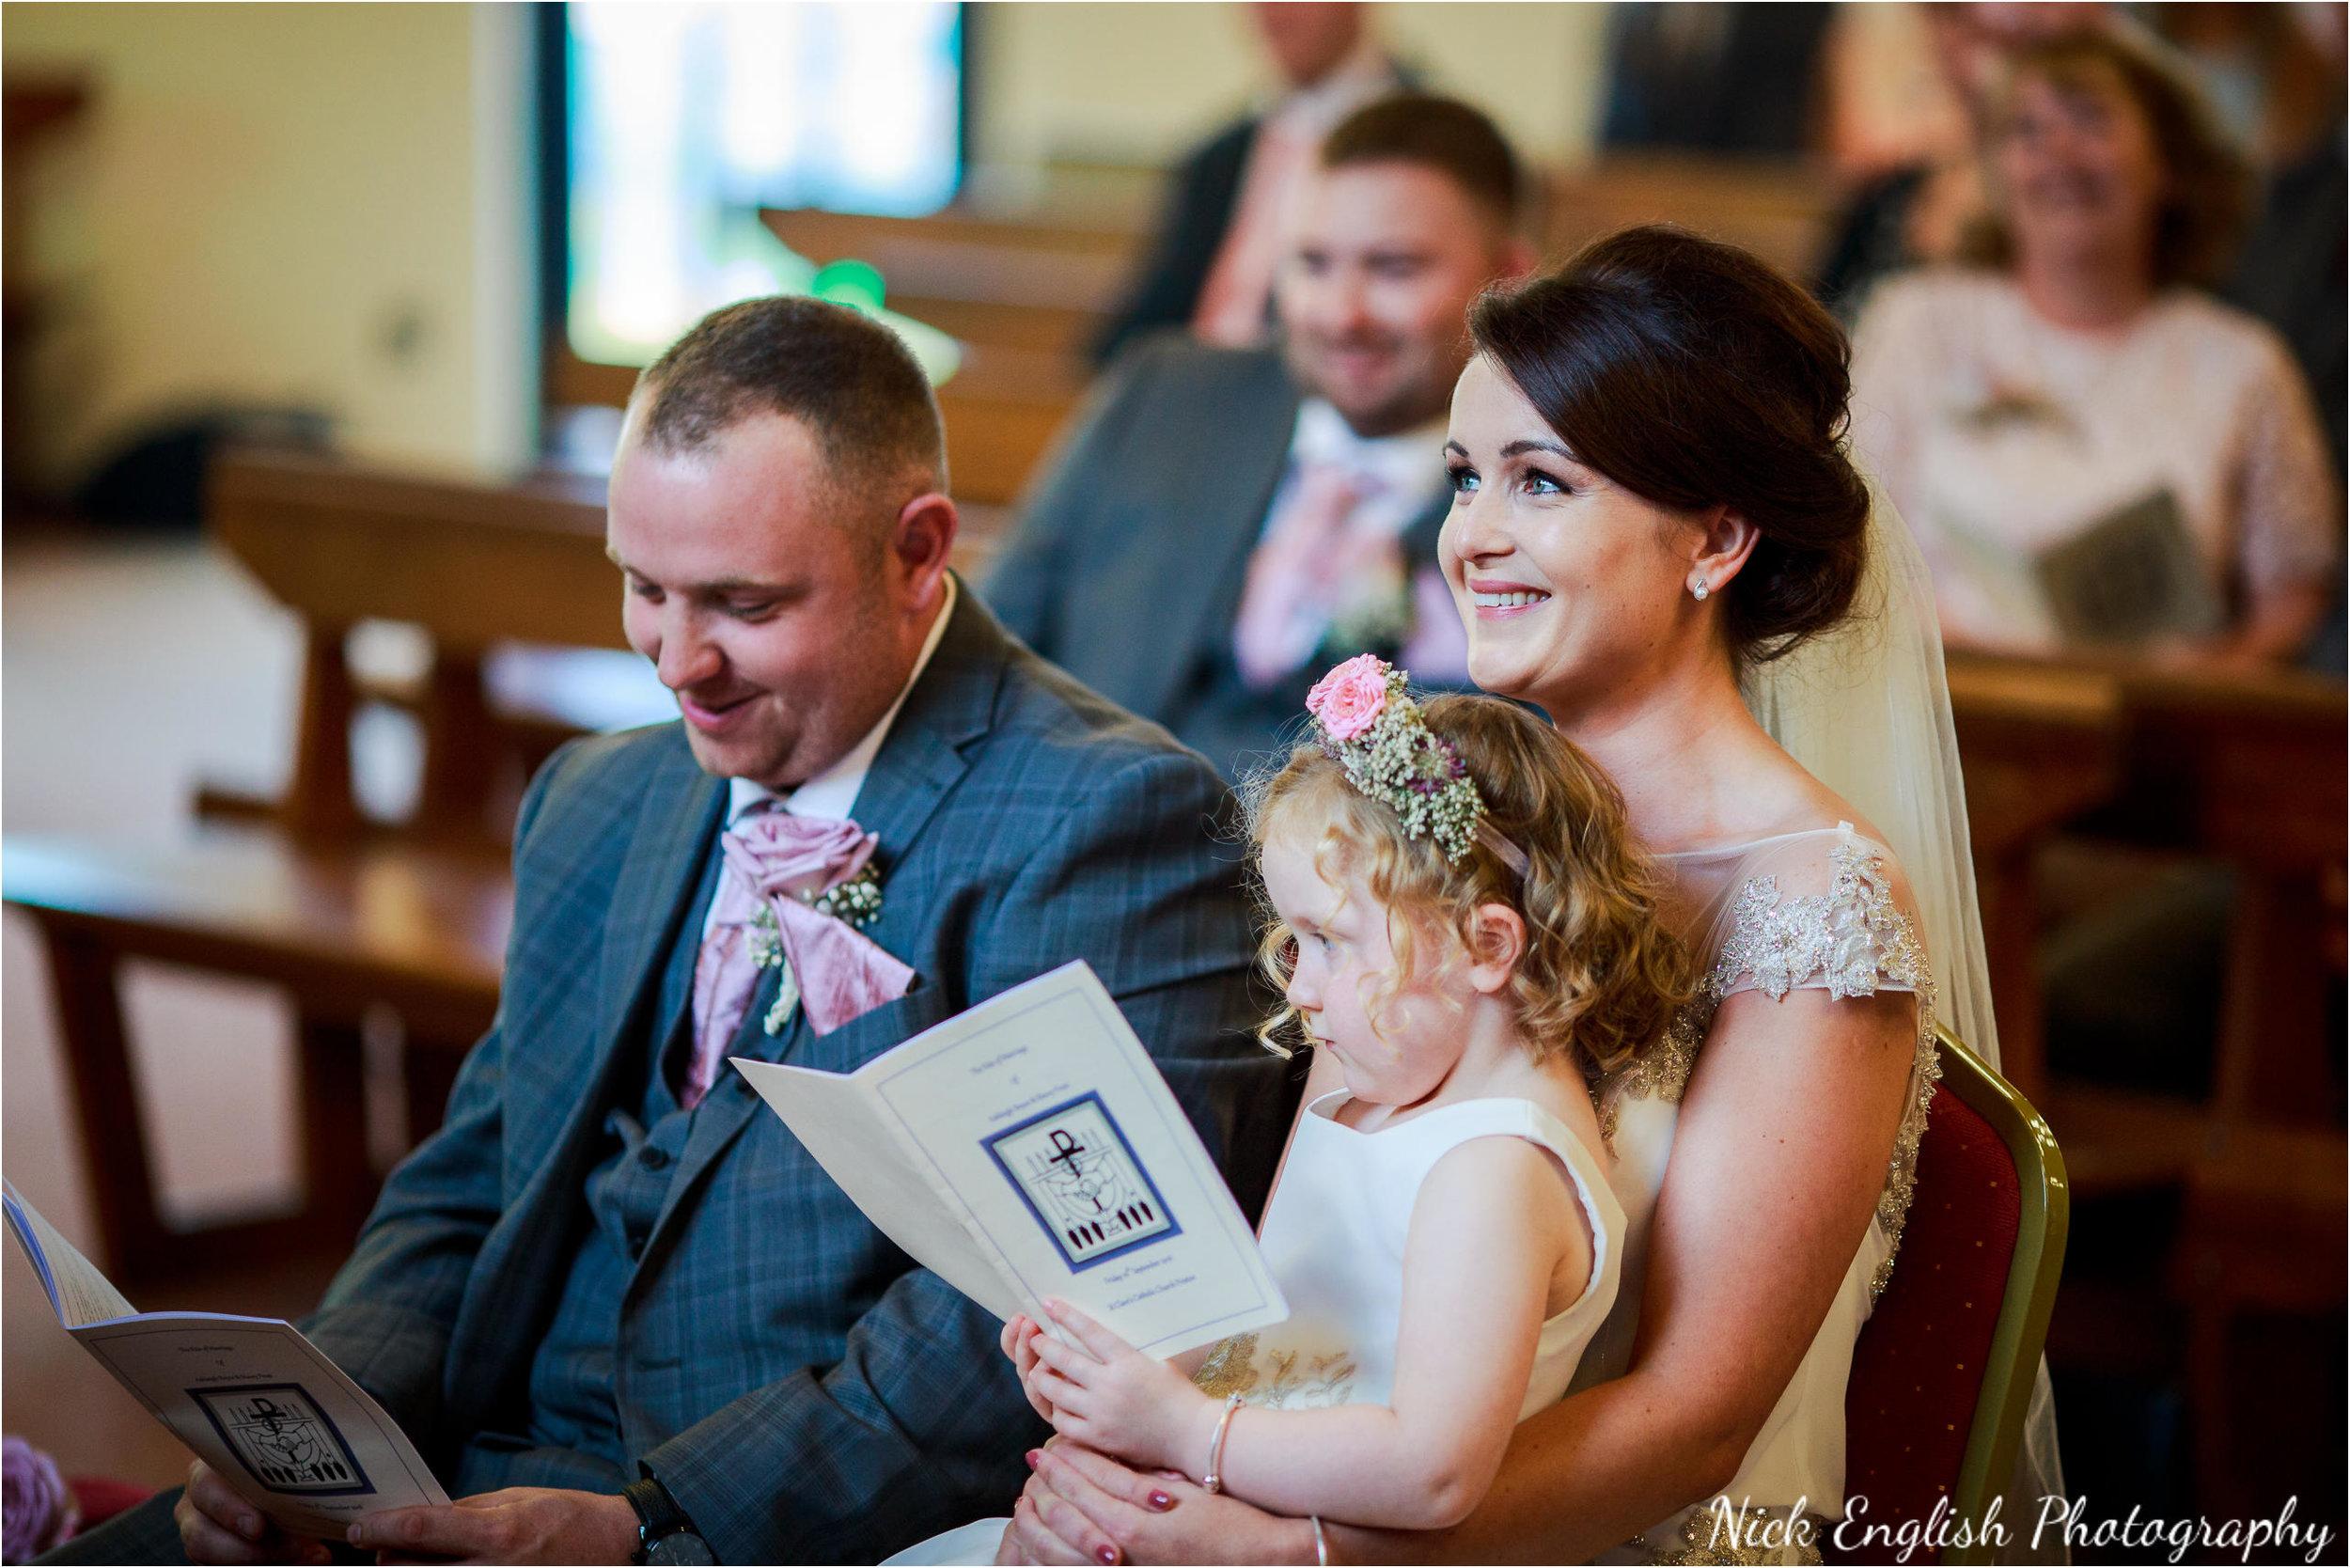 Stacey-Ash-Wedding-Photographs-Stanley-House-Preston-Lancashire-55.jpg